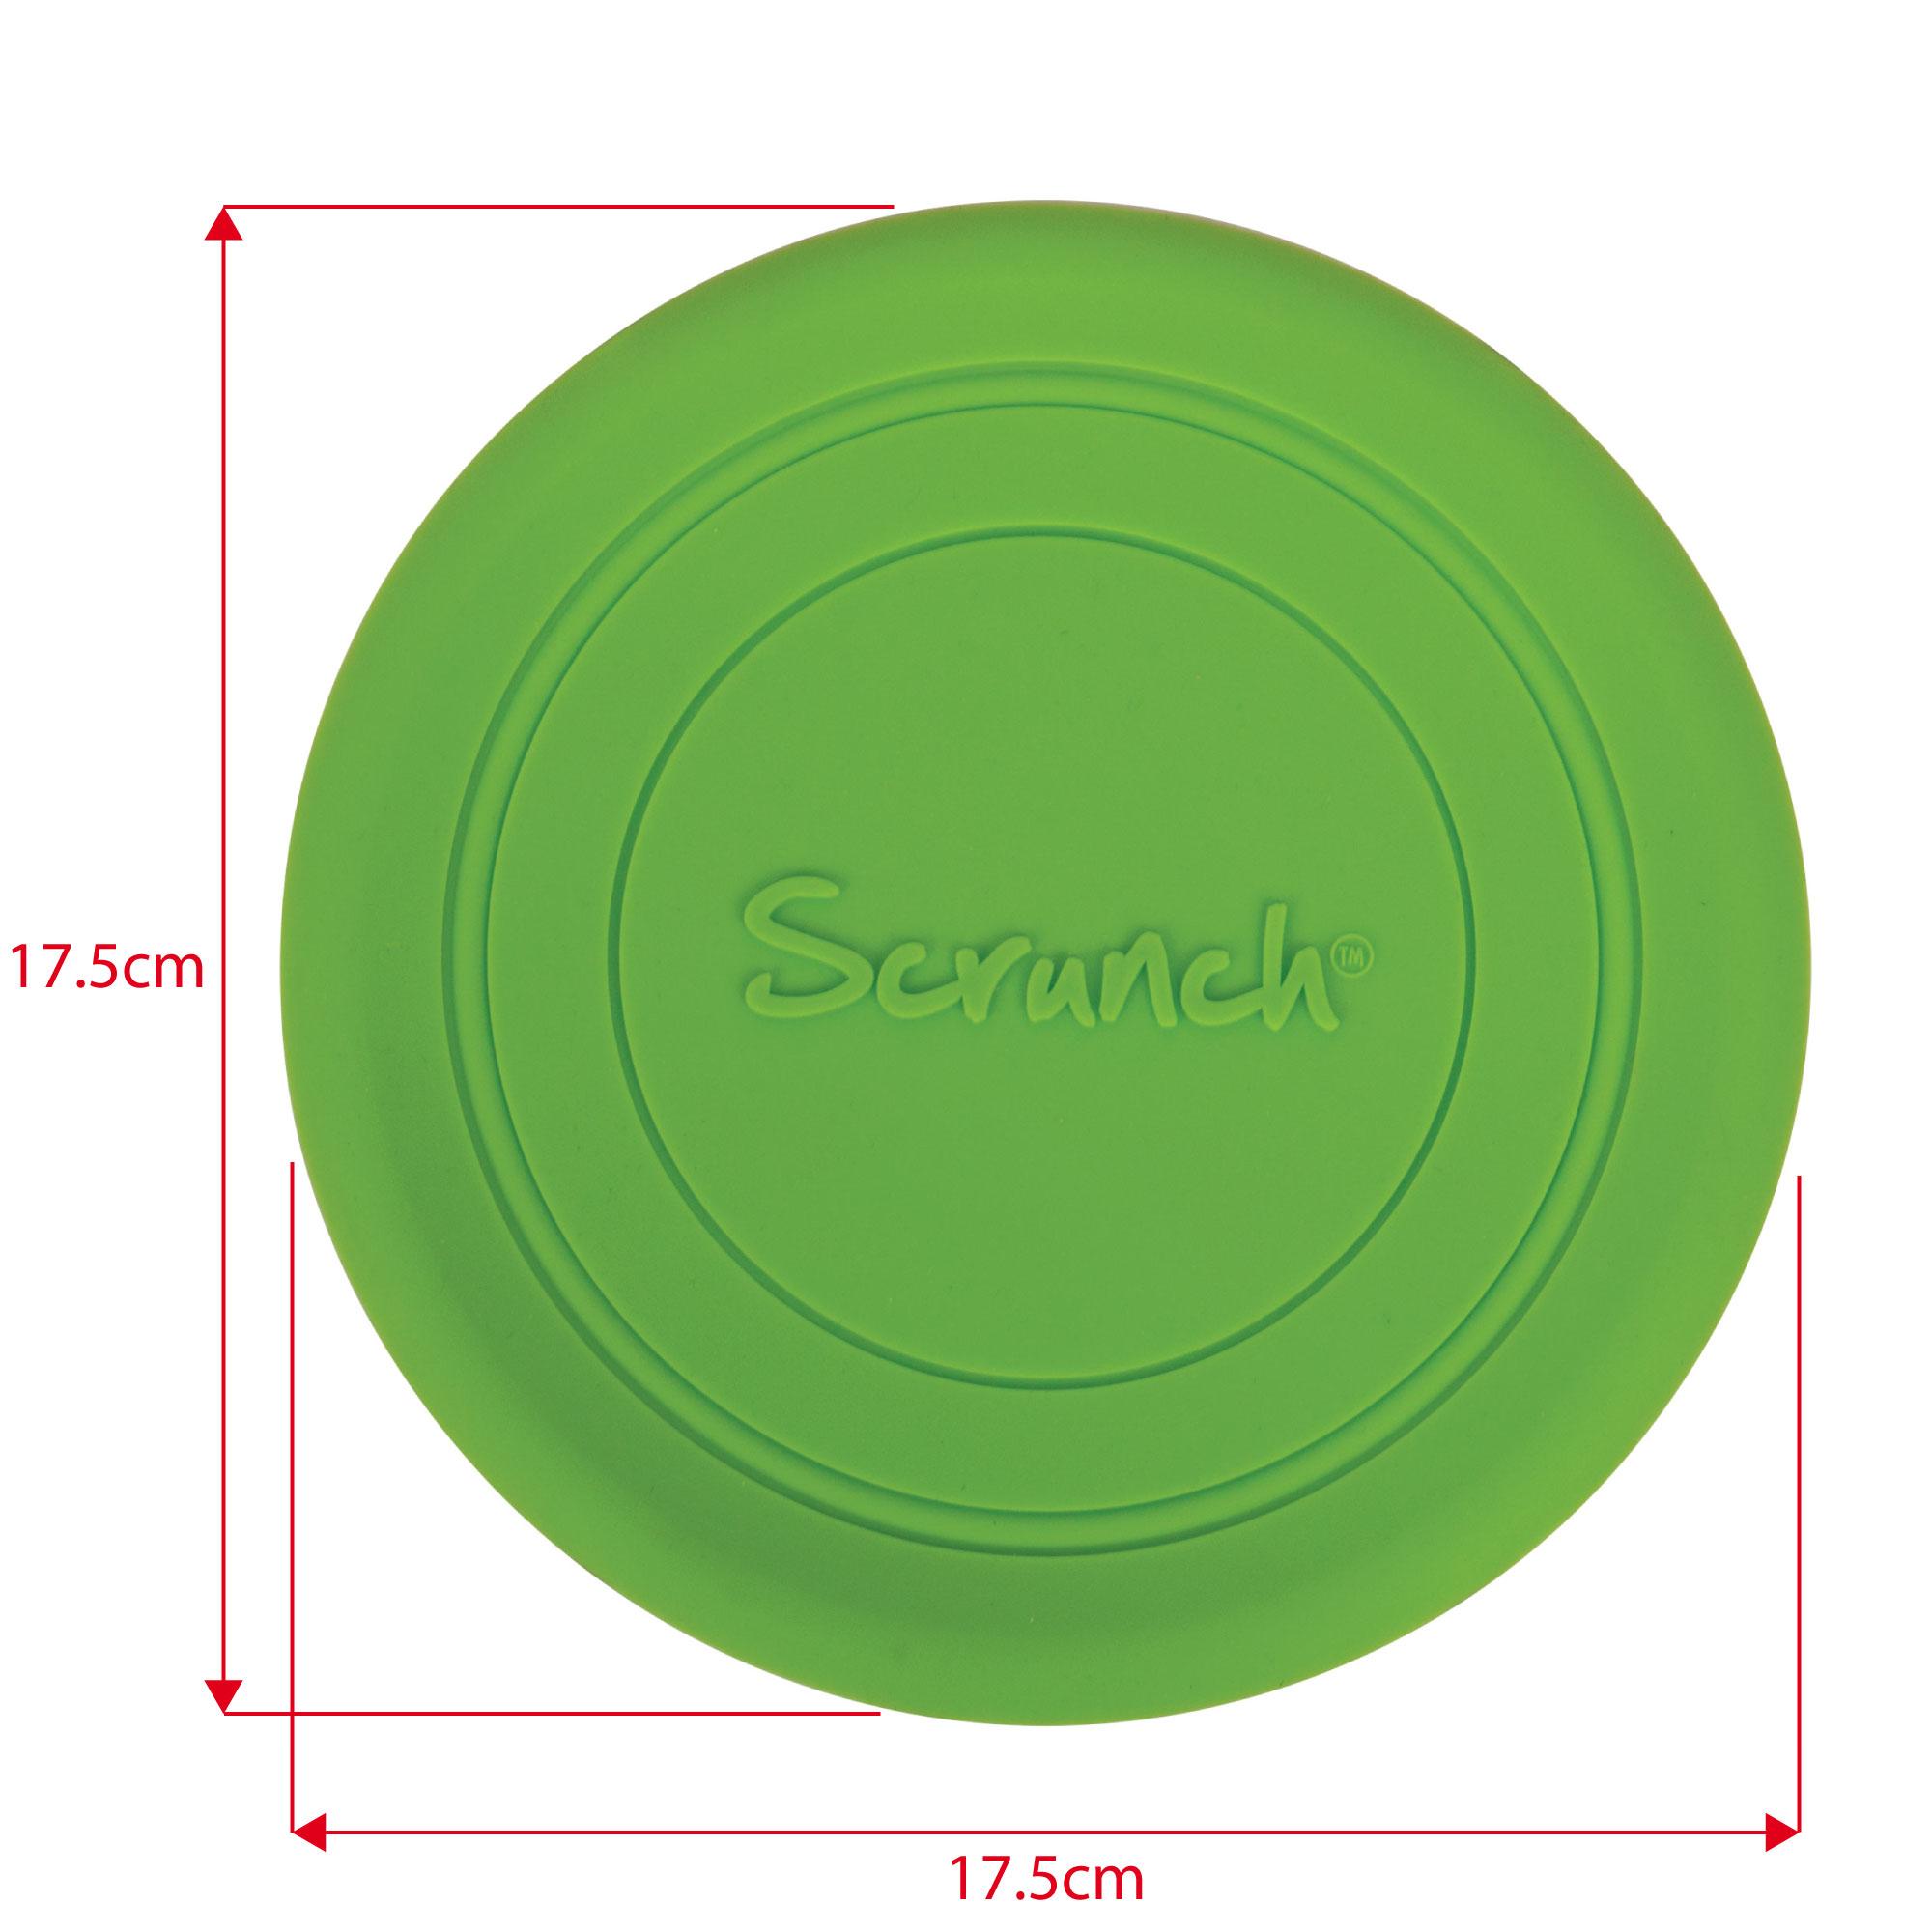 Scrunch-Frisbee-al-aire-libre-y-juguetes-de-playa miniatura 14